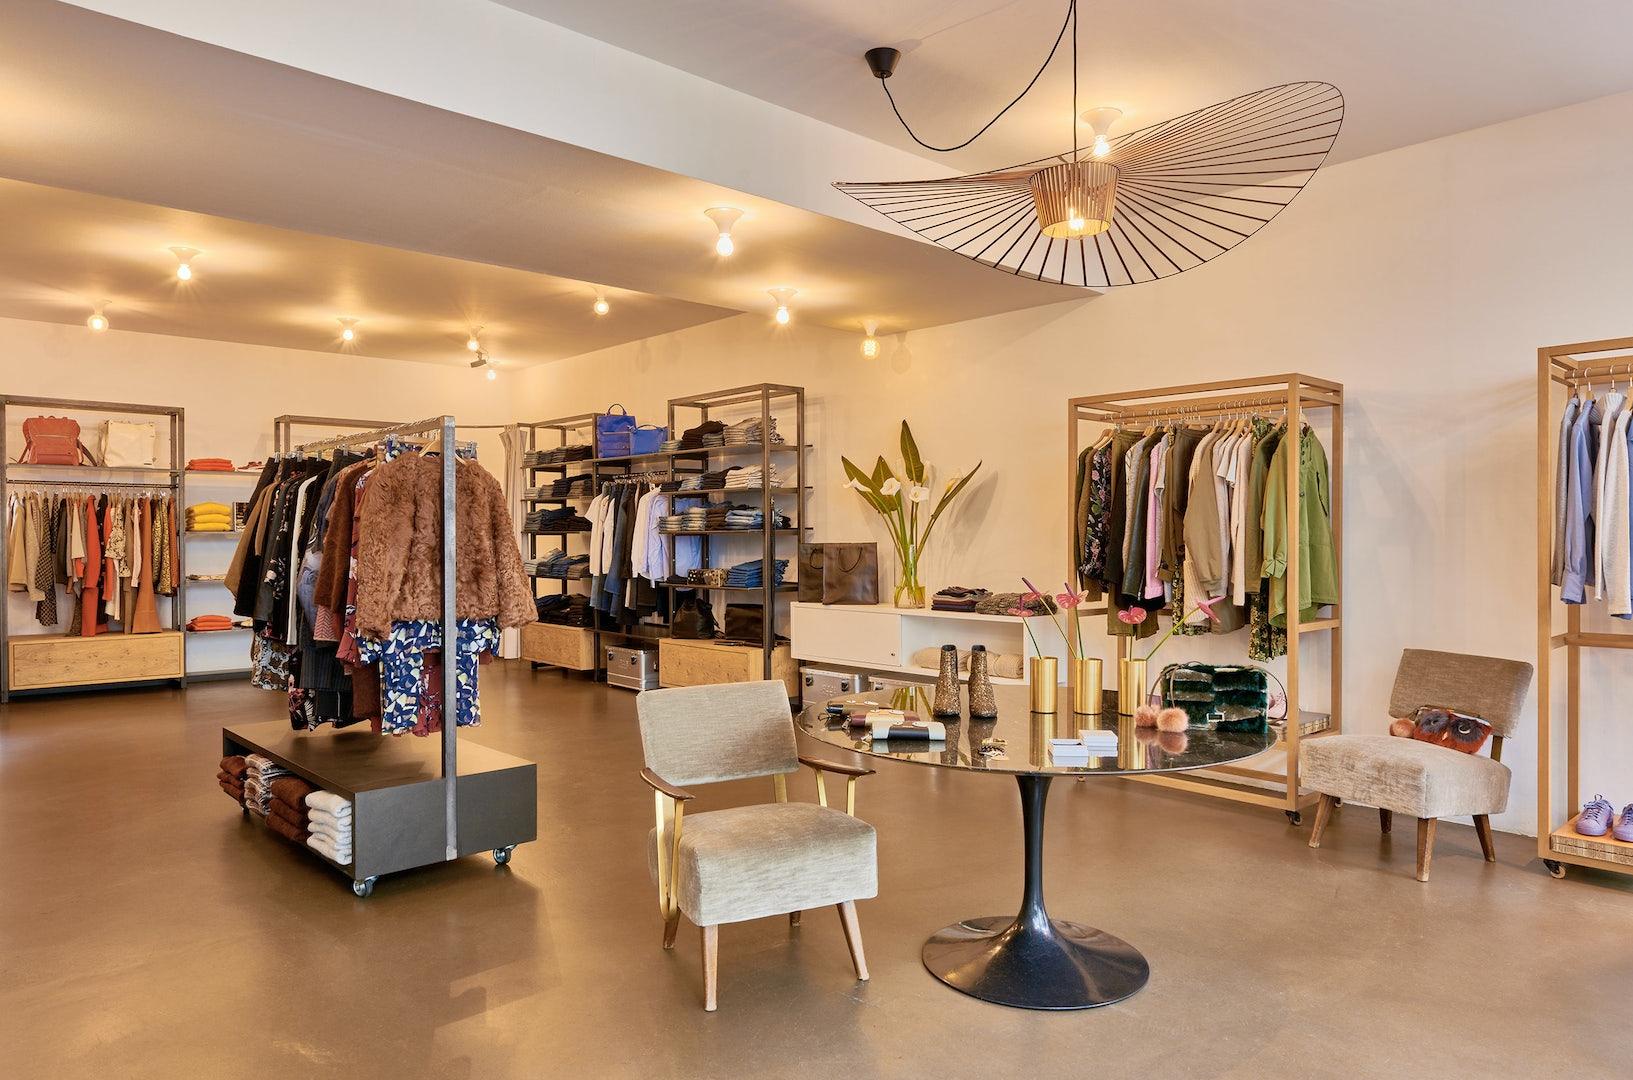 Alpenraum shop